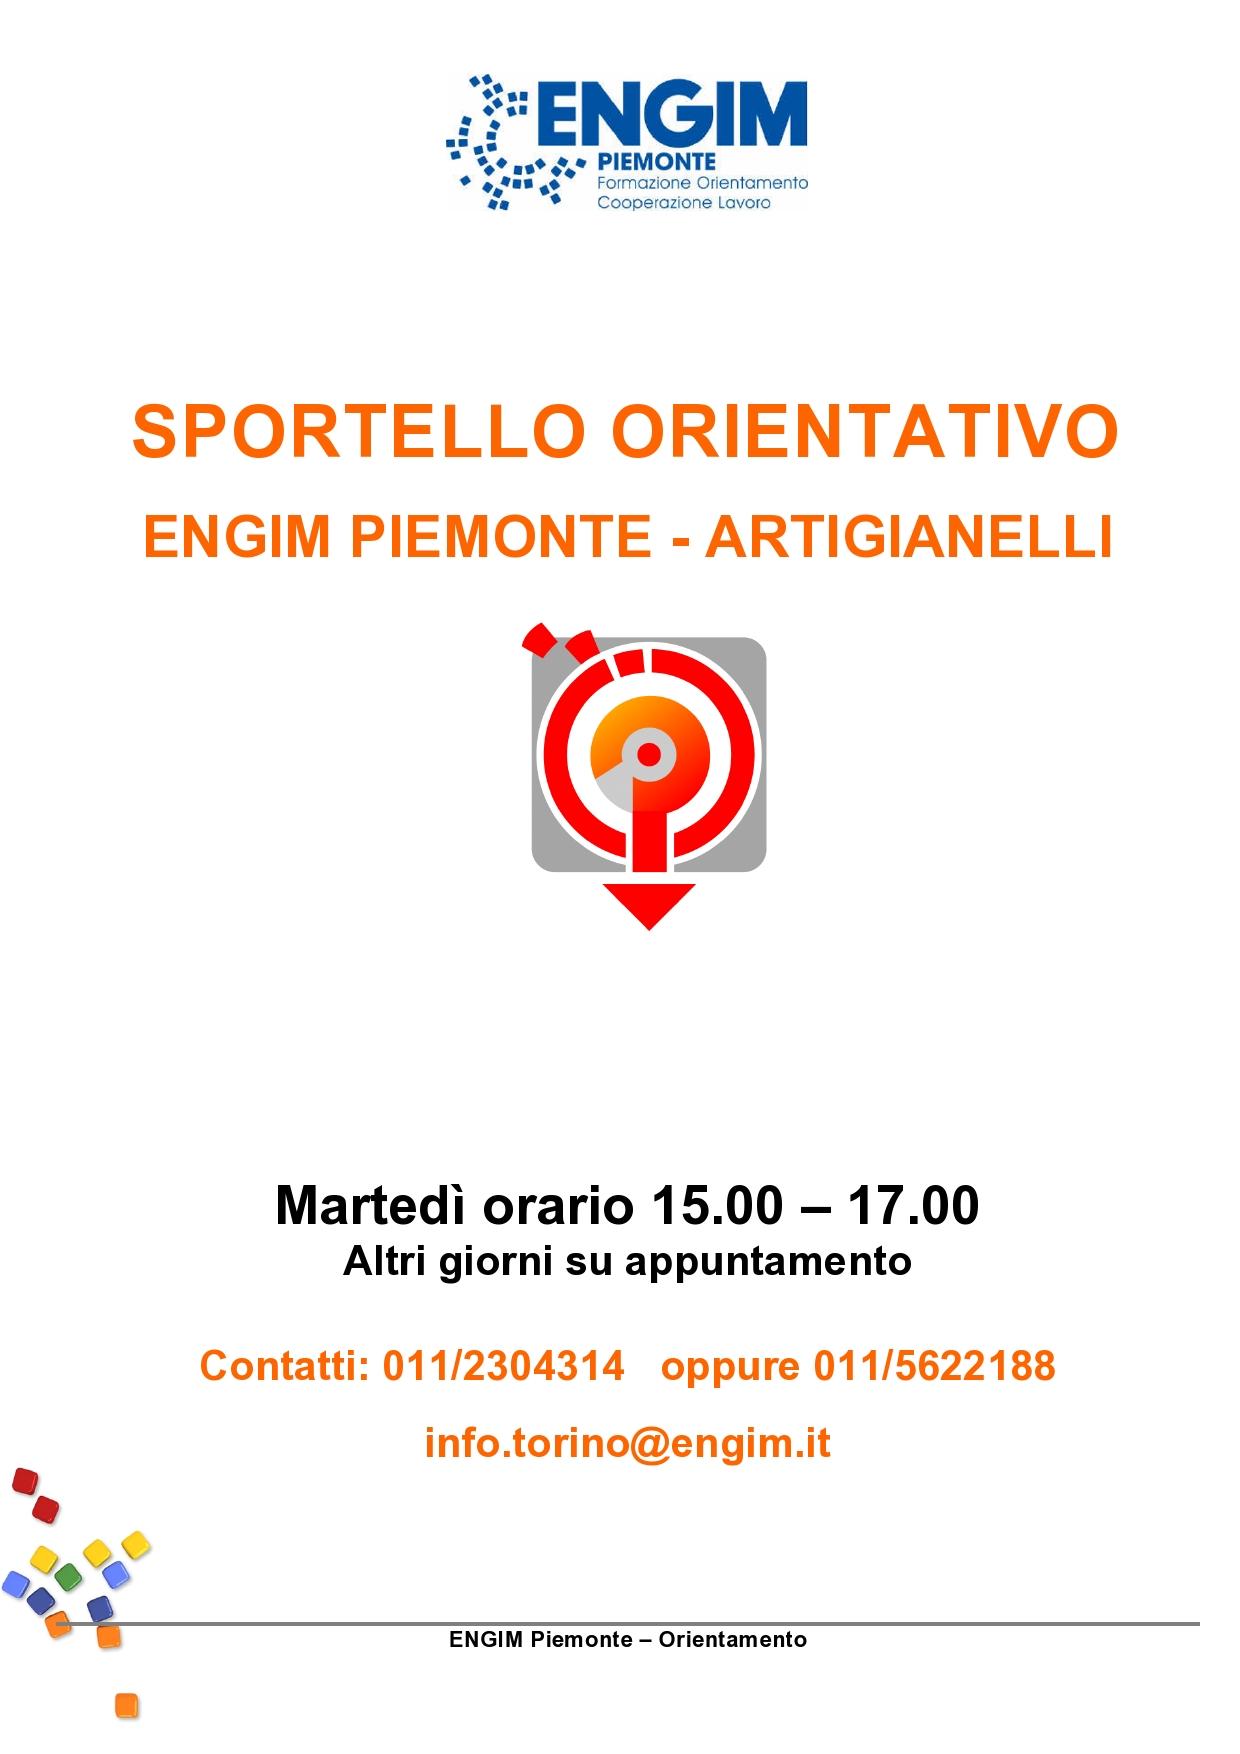 SPORTELLO ENGIM (1